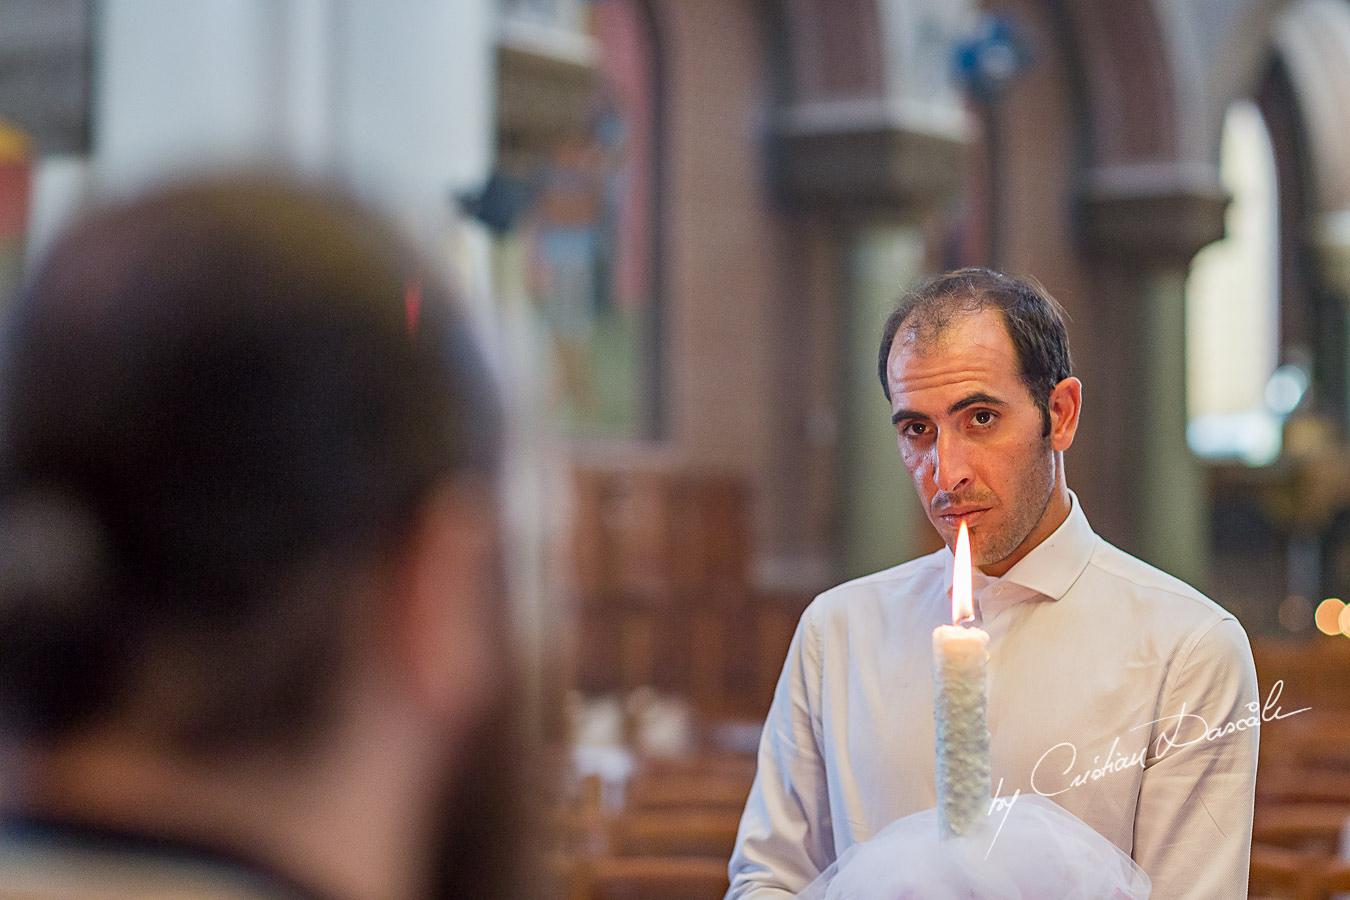 Angelic Christening in Limassol - 31